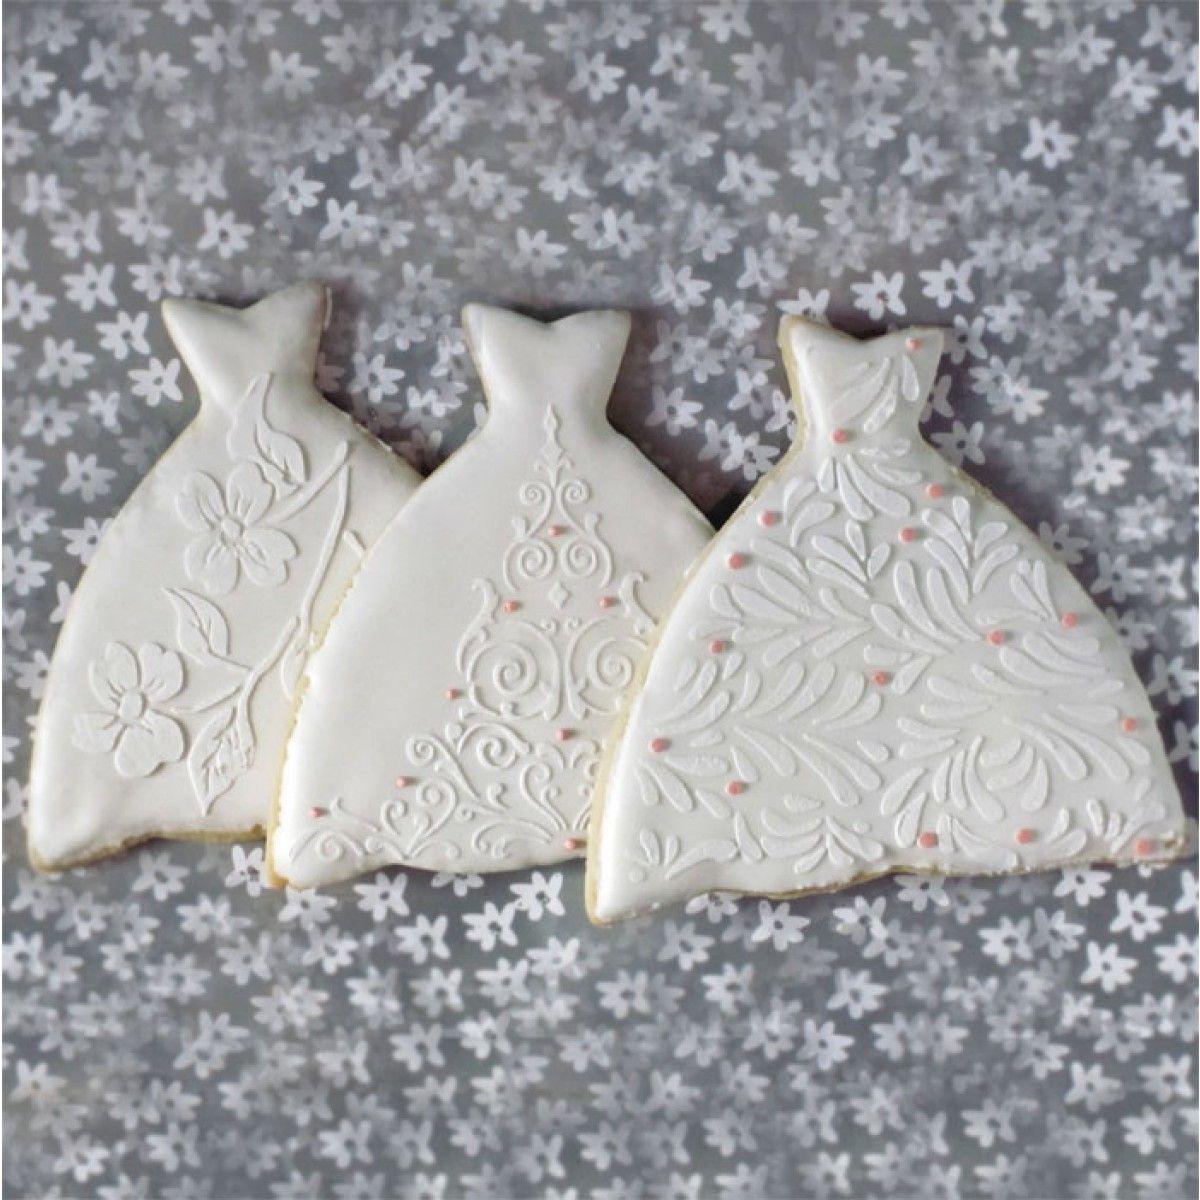 Ball Gown Cookie Stencil Set